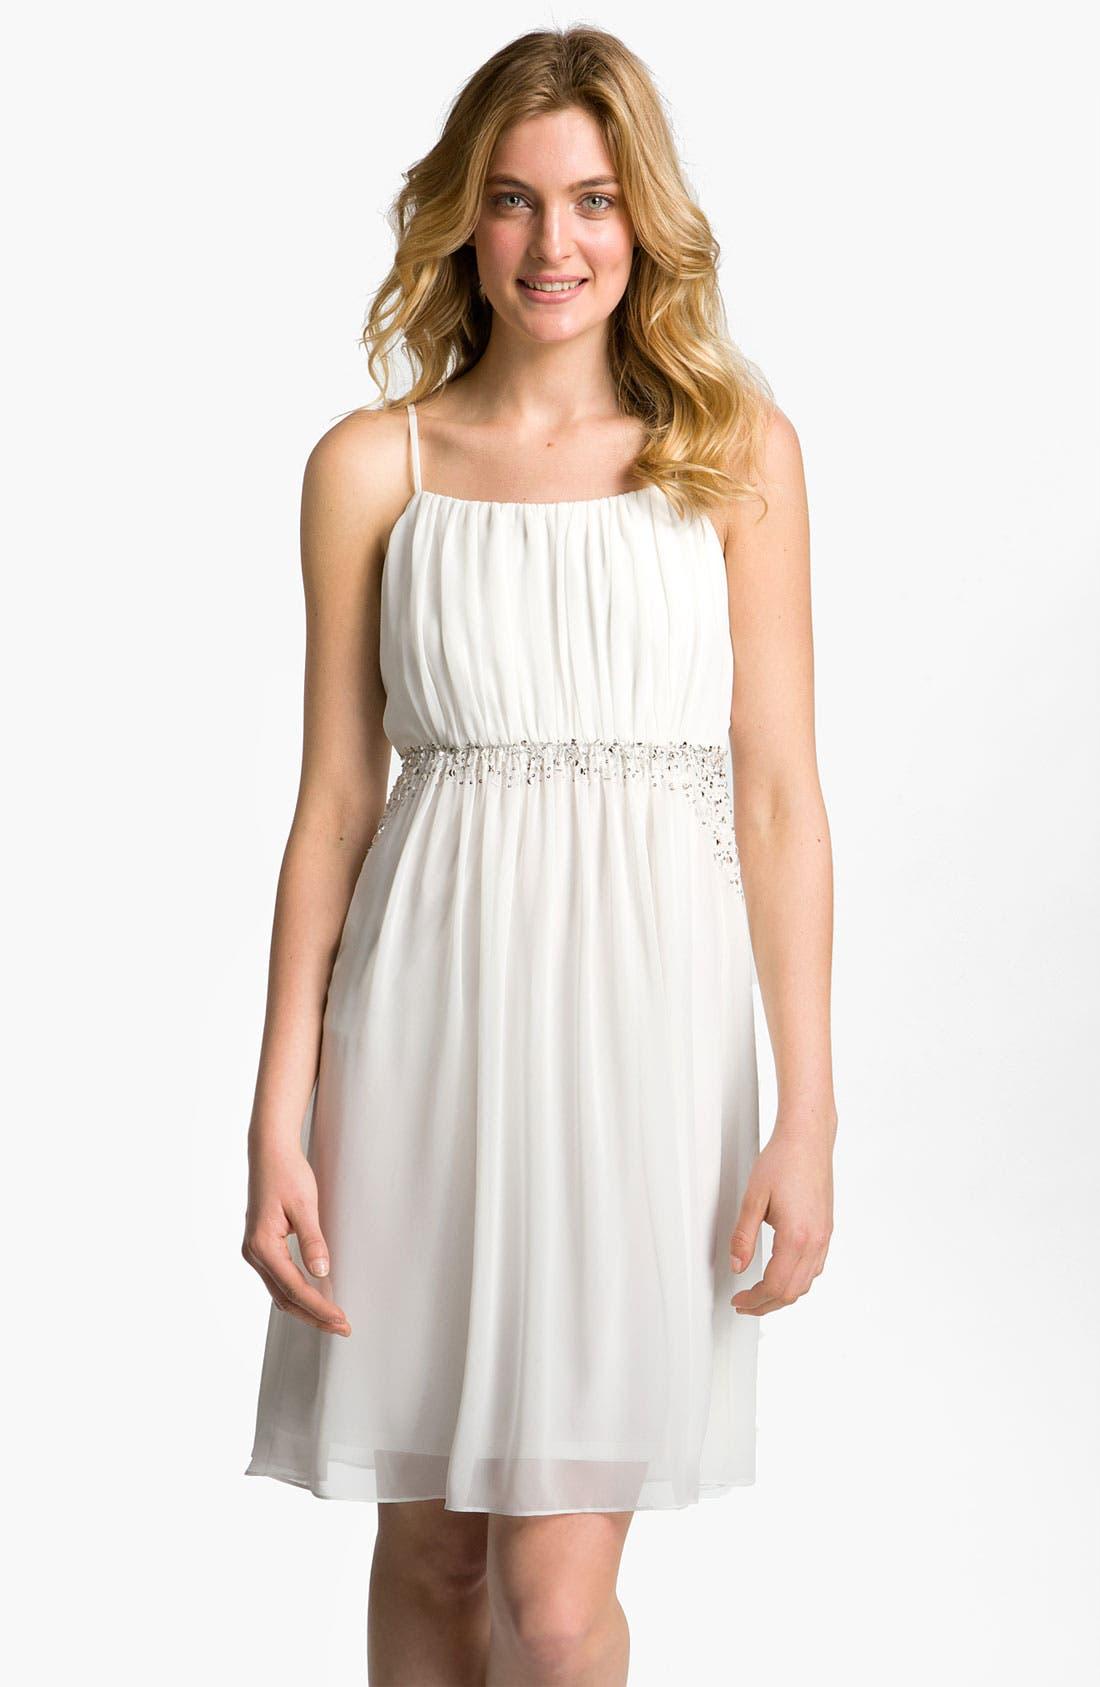 Main Image - Calvin Klein Embellished Chiffon Dress